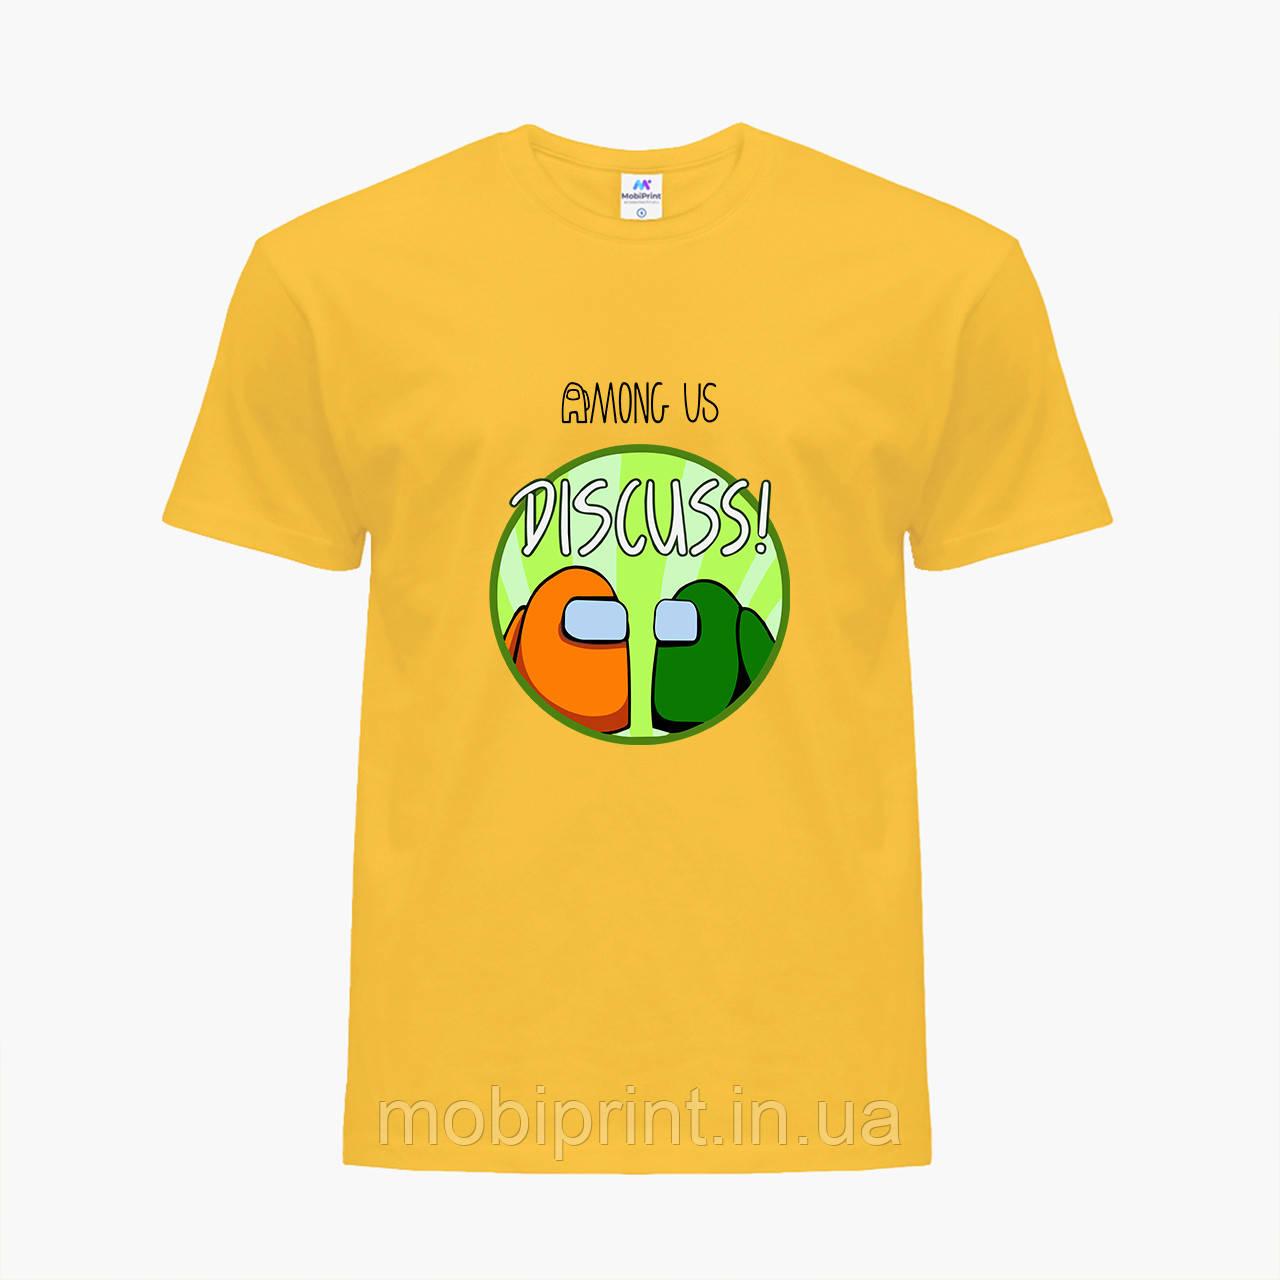 Дитяча футболка для хлопчиків Амонг Ас (Among Us) (25186-2588) Жовтий